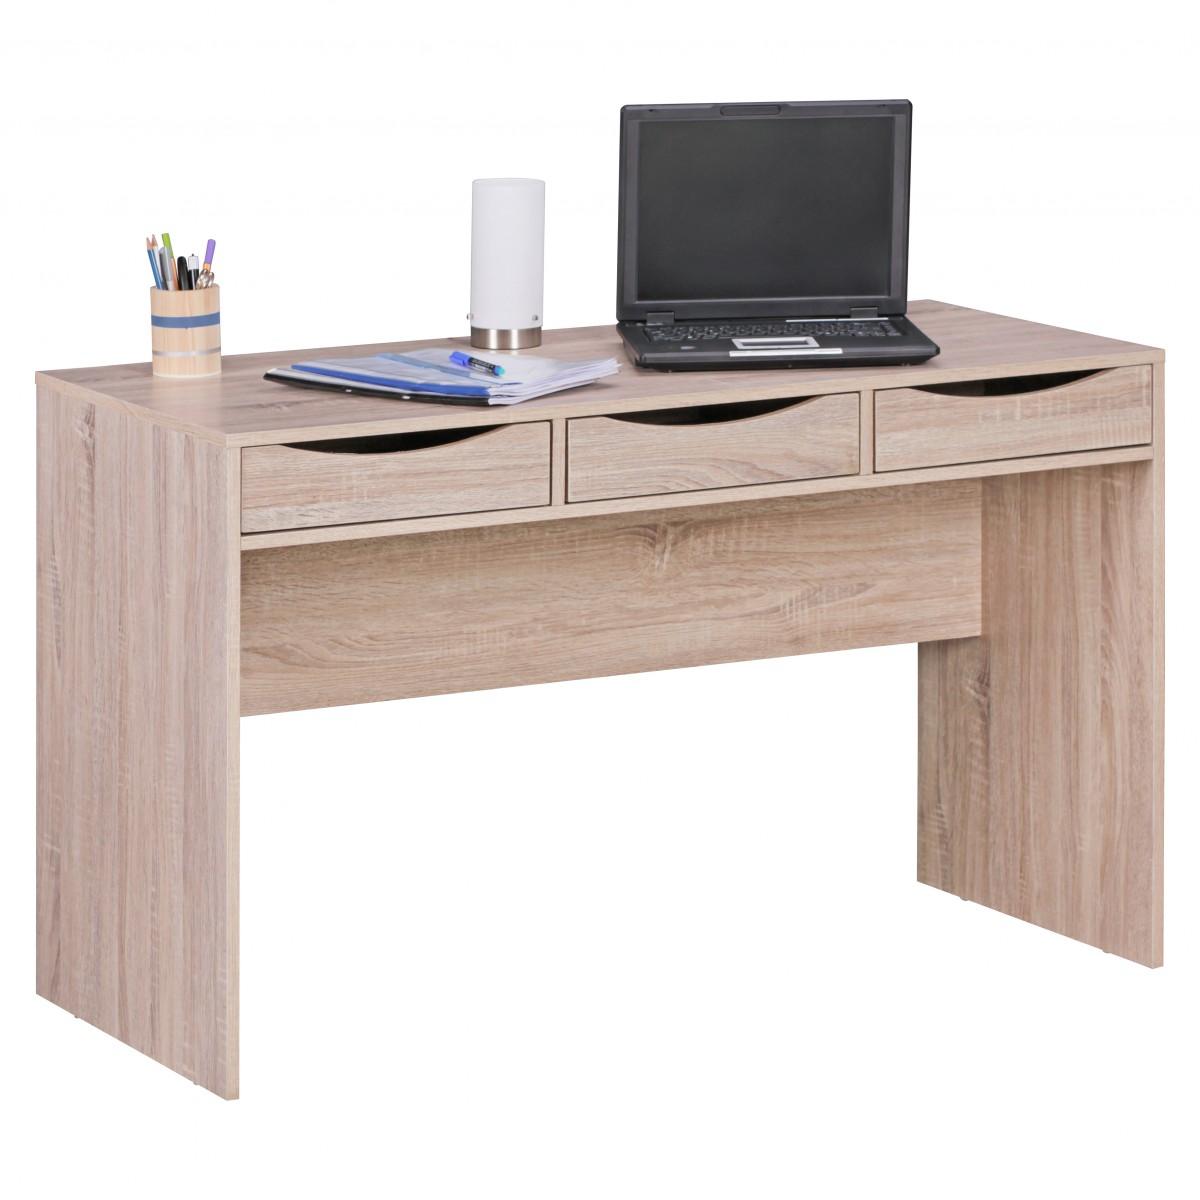 couchtische beistelltische beleuchteter tische howe deko online shop. Black Bedroom Furniture Sets. Home Design Ideas